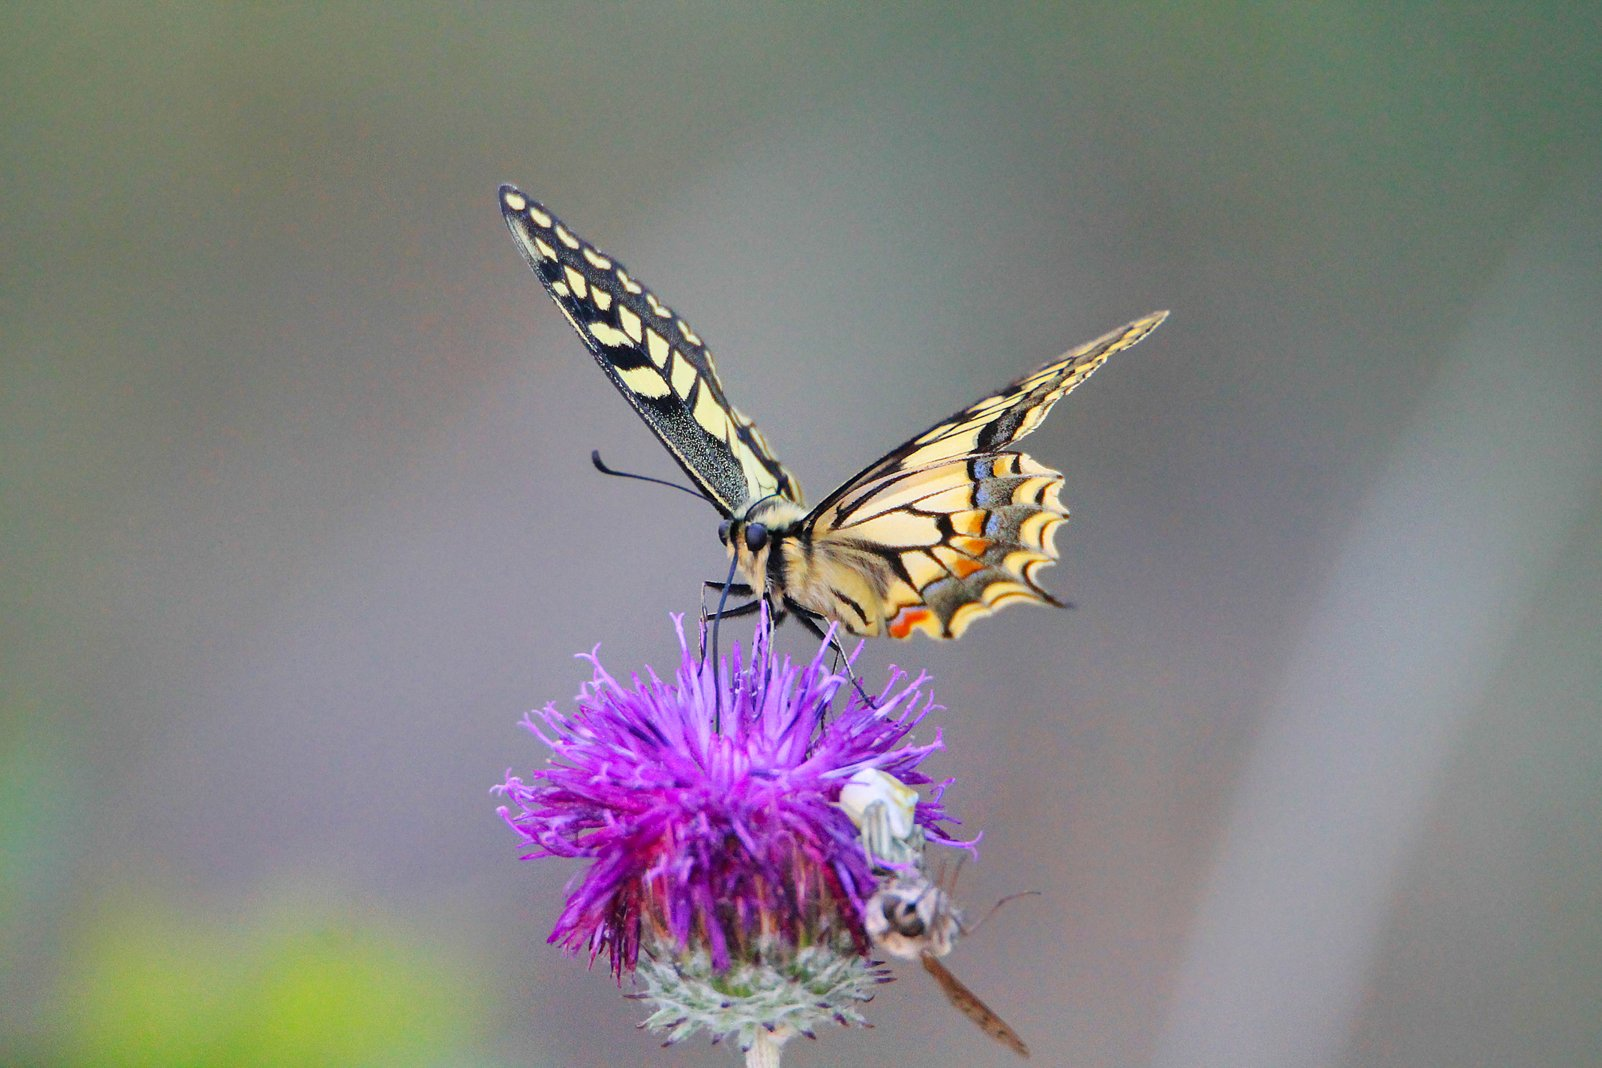 бабочка ,макро,фауна., Magov Marat